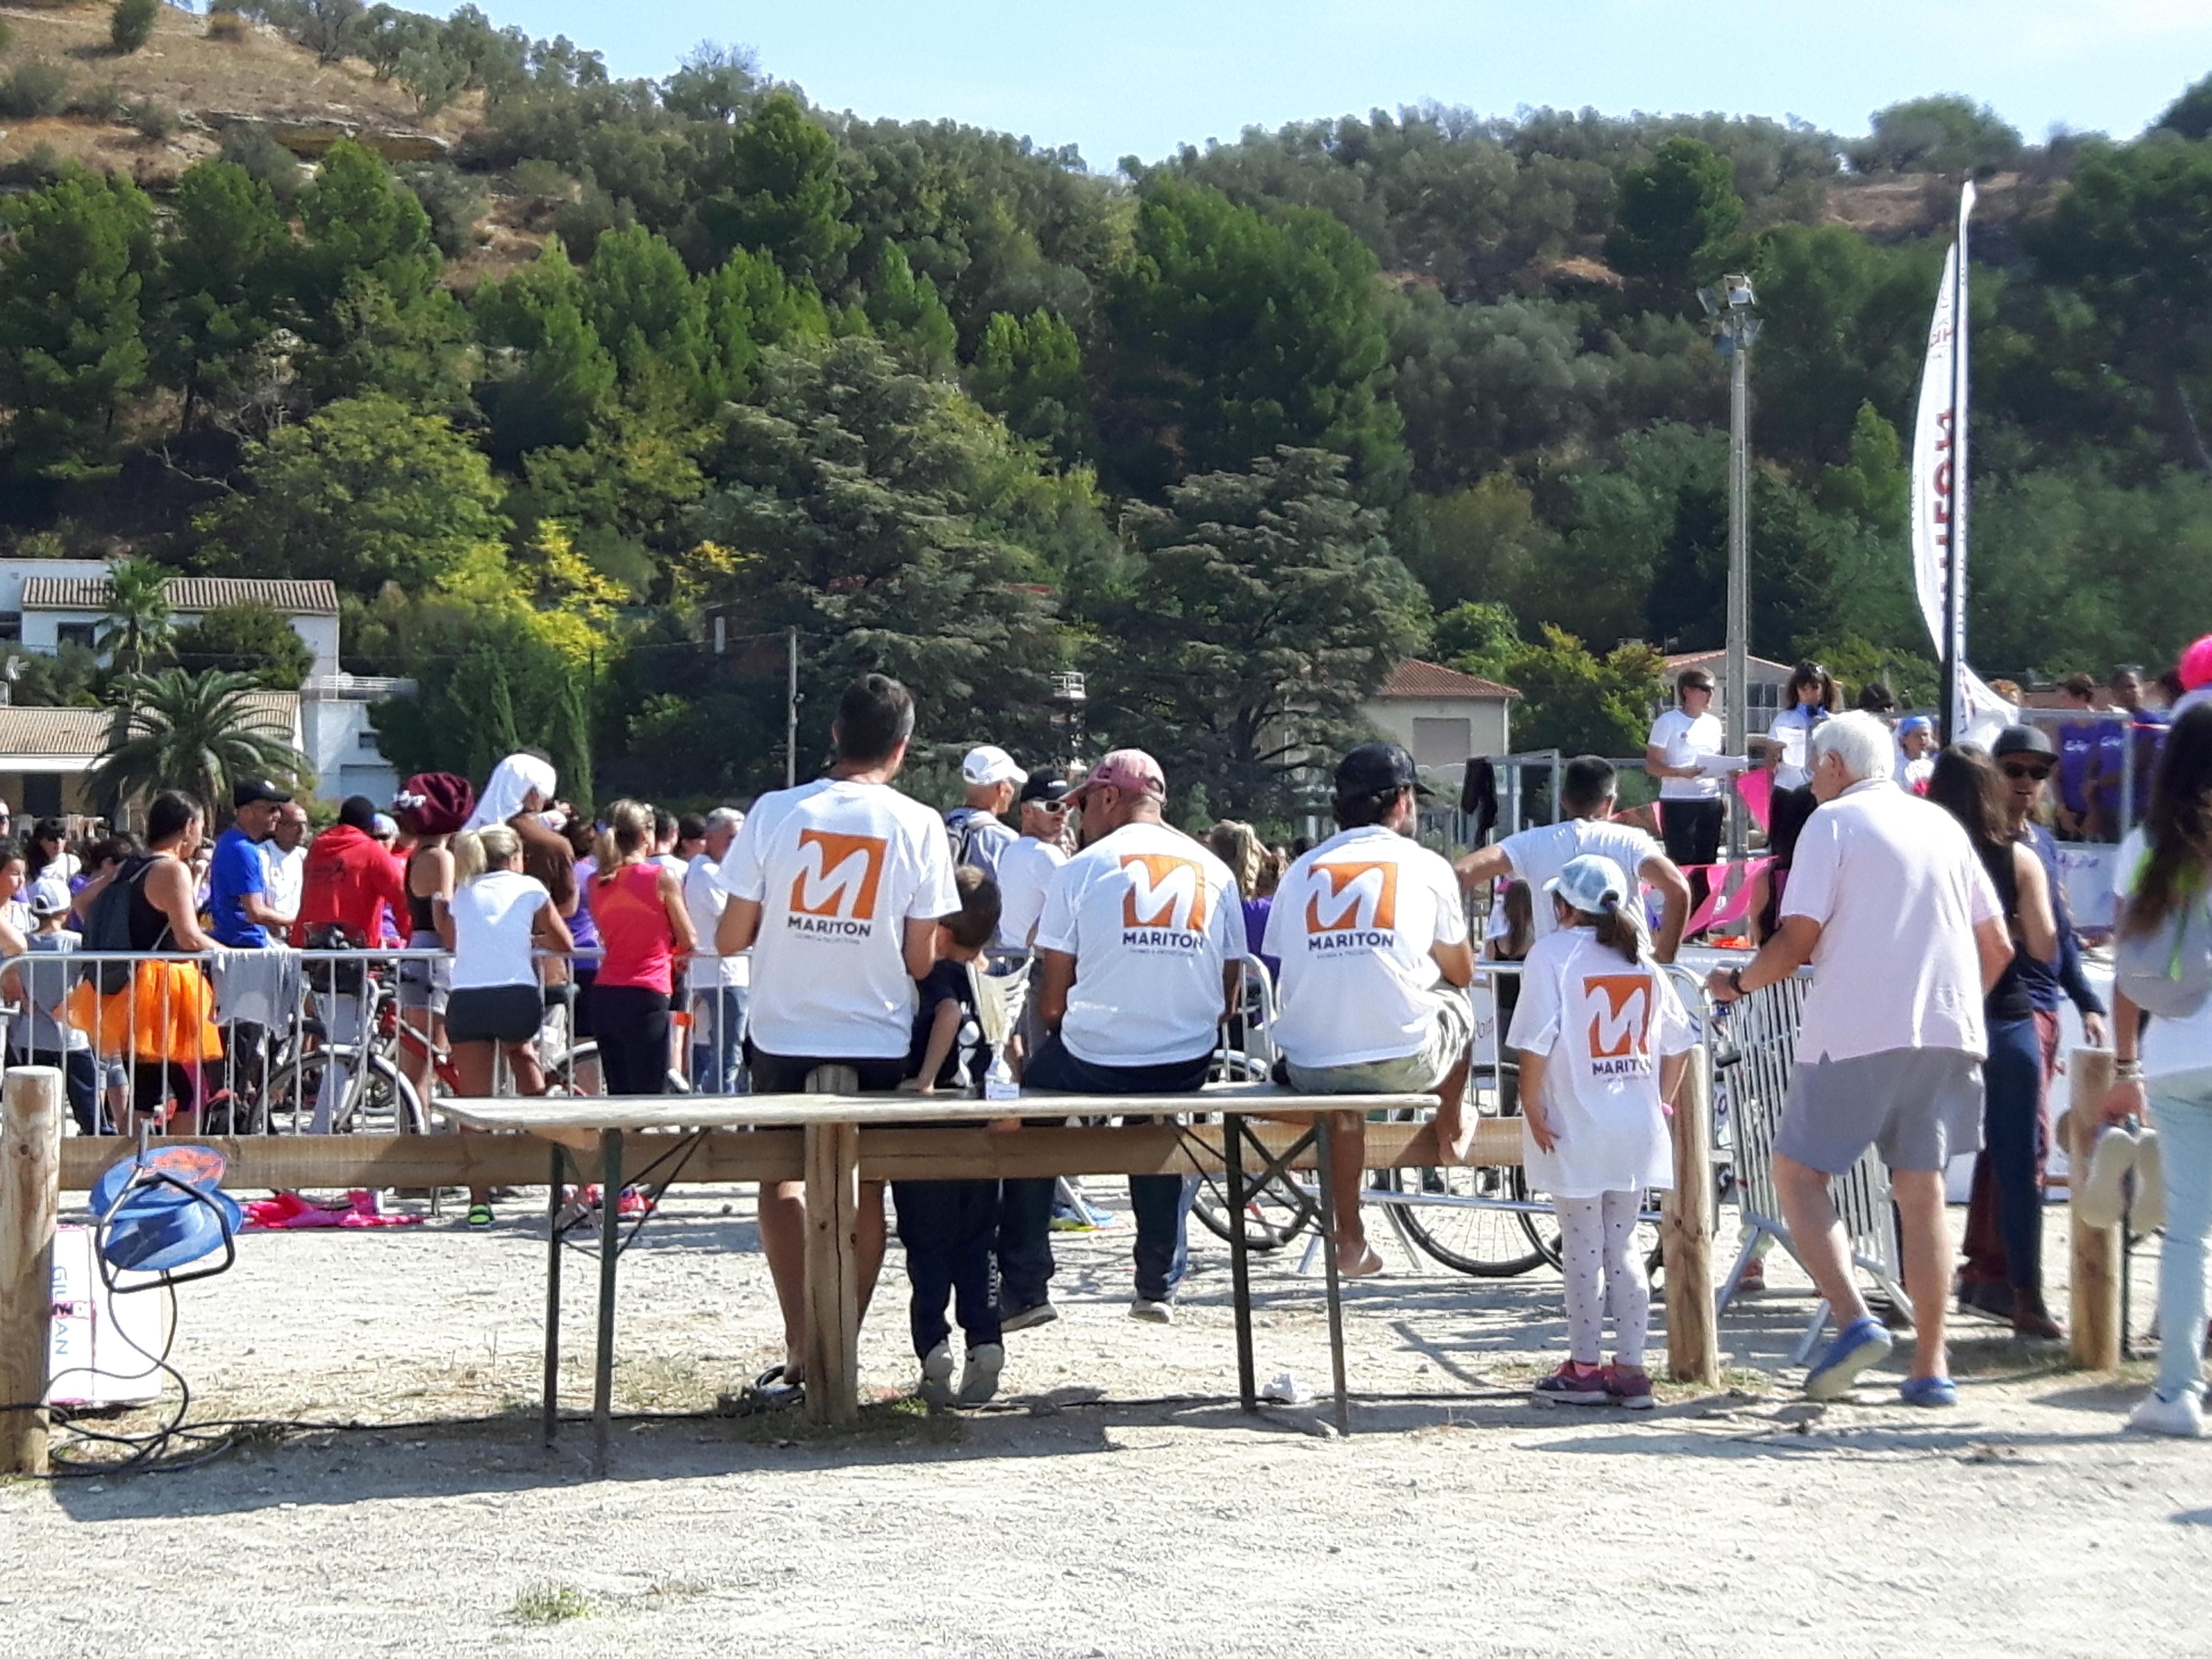 Mariton, sponsor du triathlon Les 3 Elles Roses